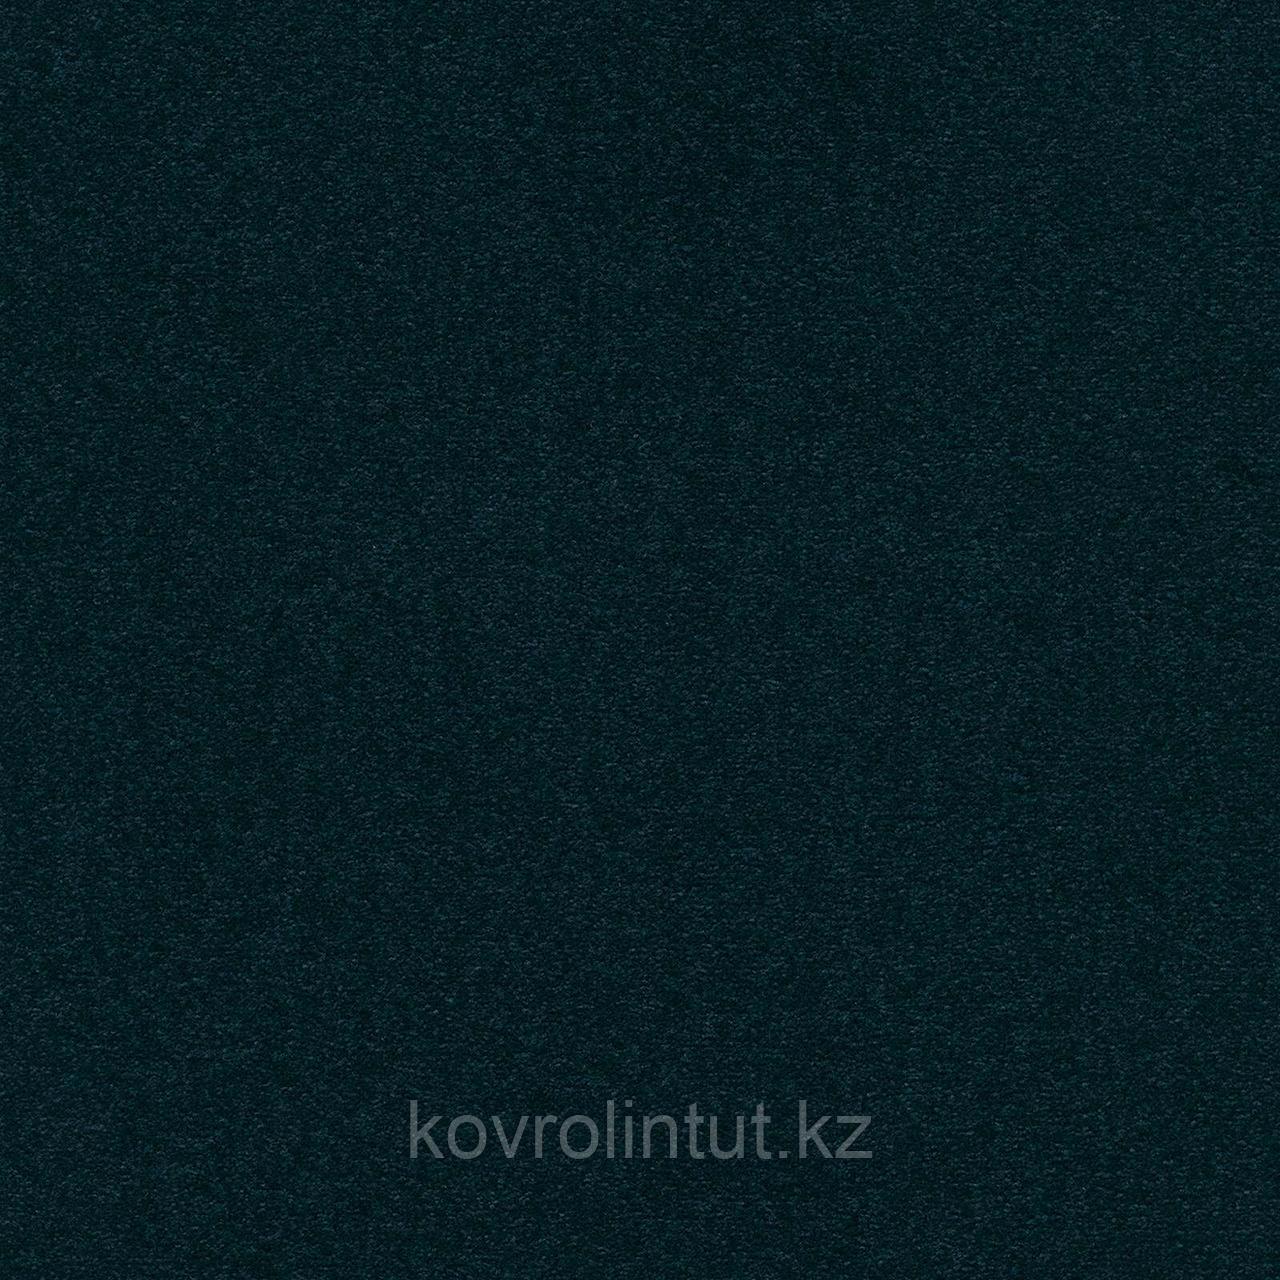 Плитка ковровая Modulyss Cambridge 553, 100% PA